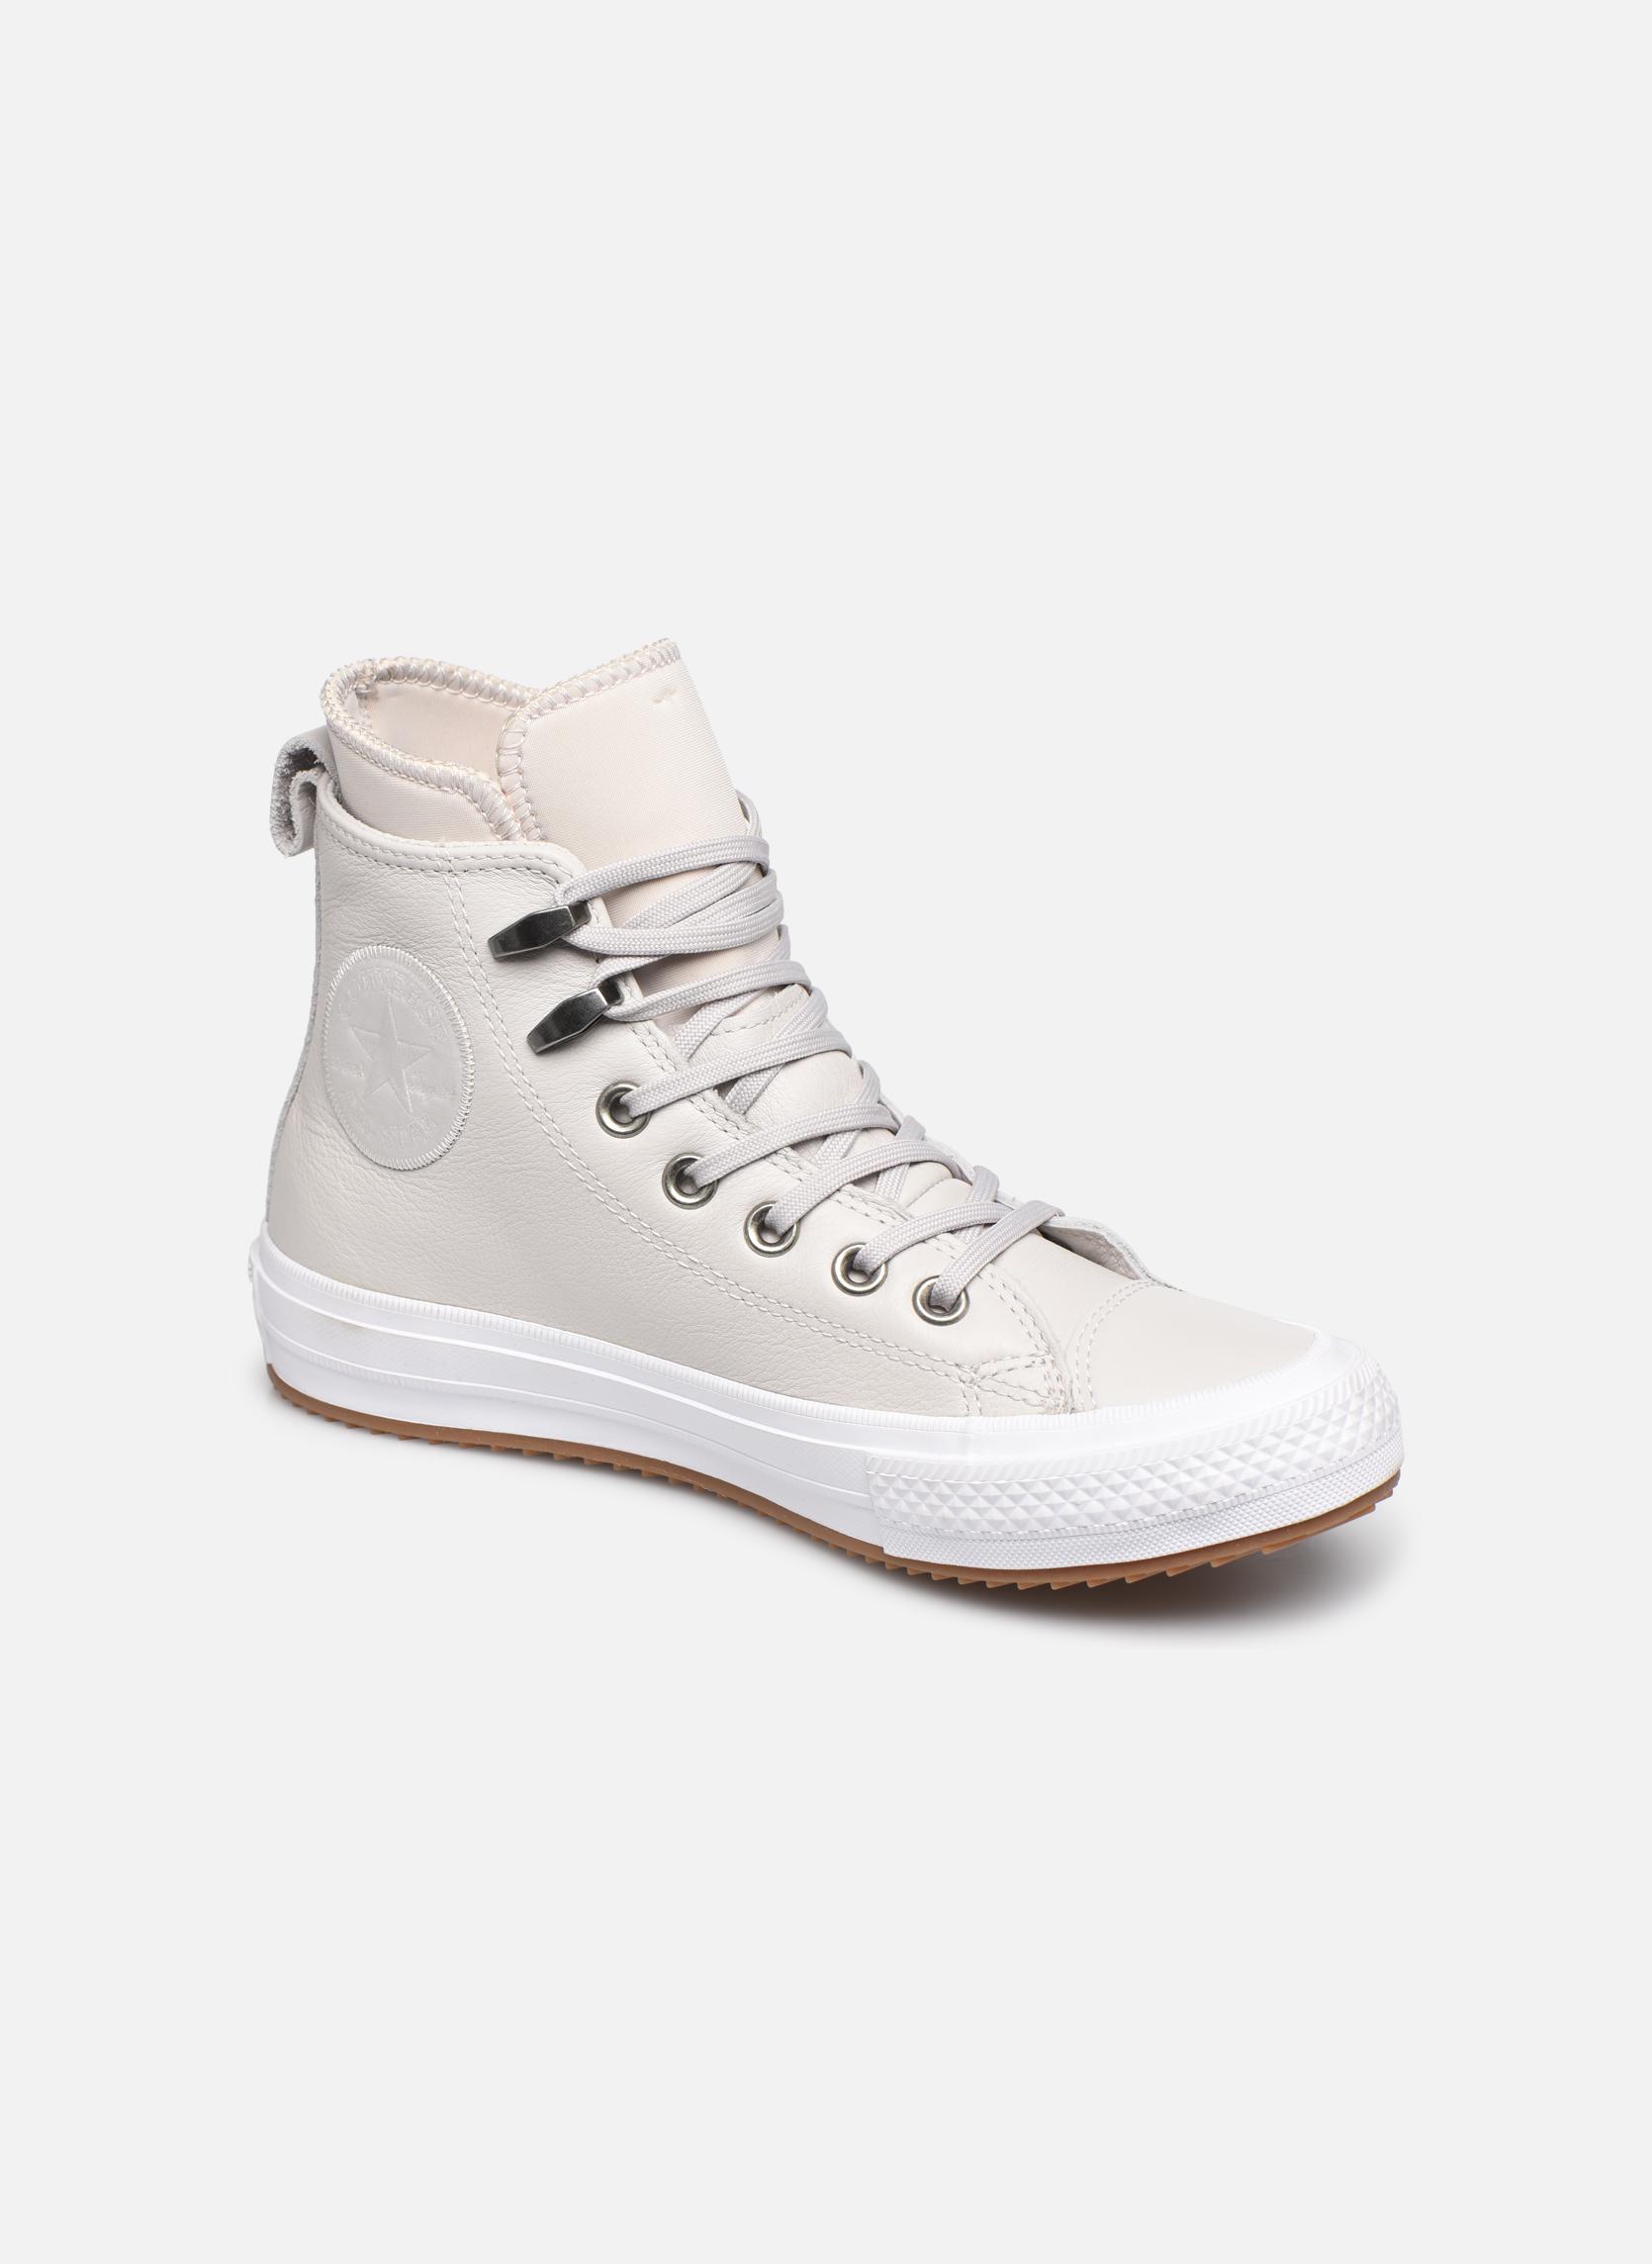 Baskets Femme Chuck Taylor WP Boot WP Leather Hi